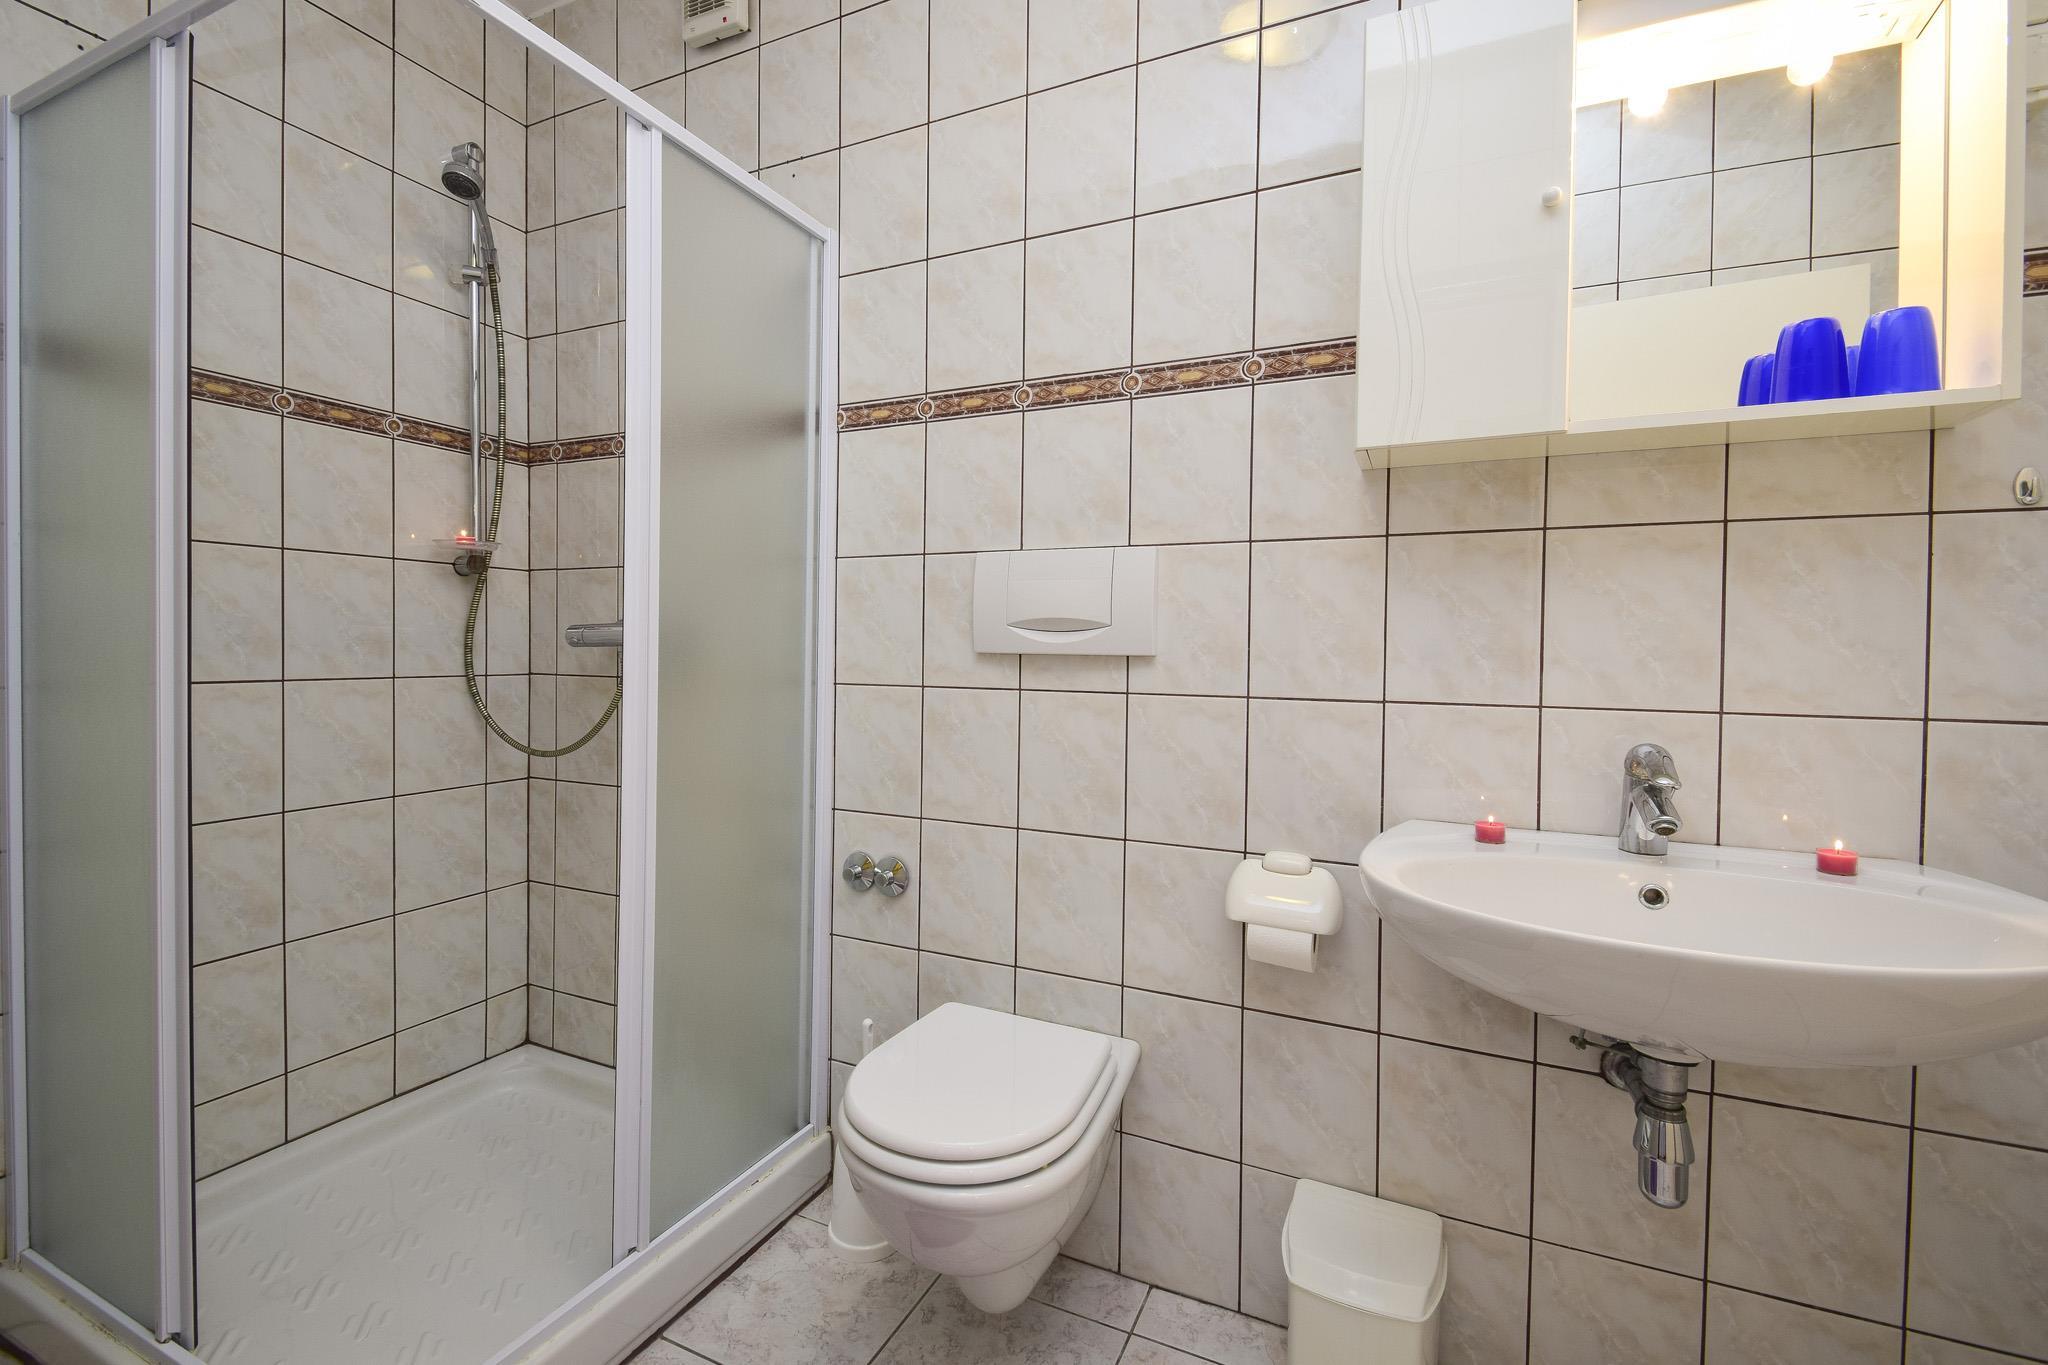 Ferienwohnung Apartments Sanja / Two bedrooms A6 (1928313), Vodice, , Dalmatien, Kroatien, Bild 7